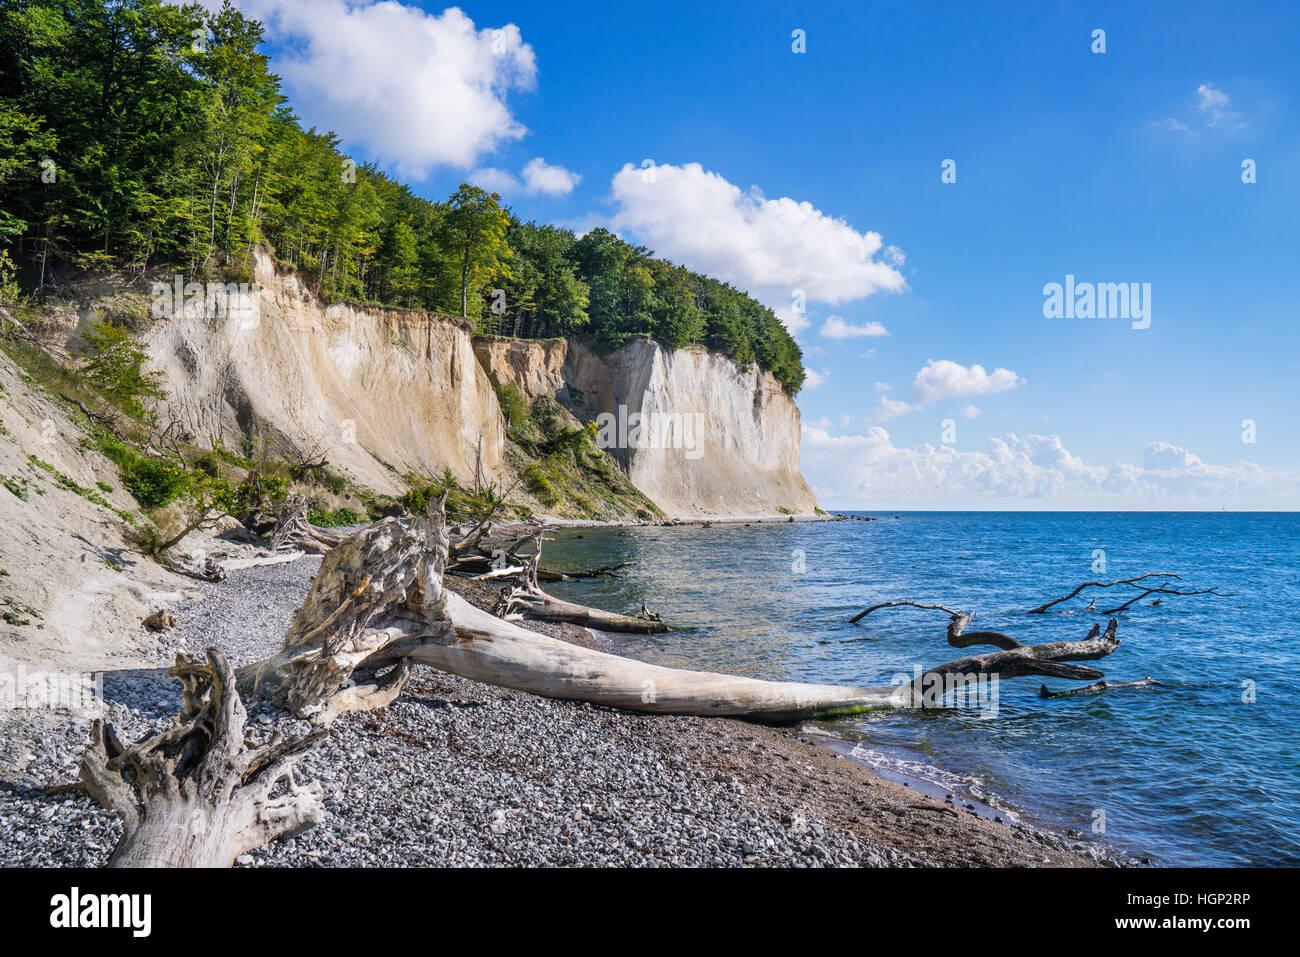 chalk cliffs at Jasmund National Park, near Königsstuhl (King's Chair) on the island of Rügen, Mecklenburg - Stock Image